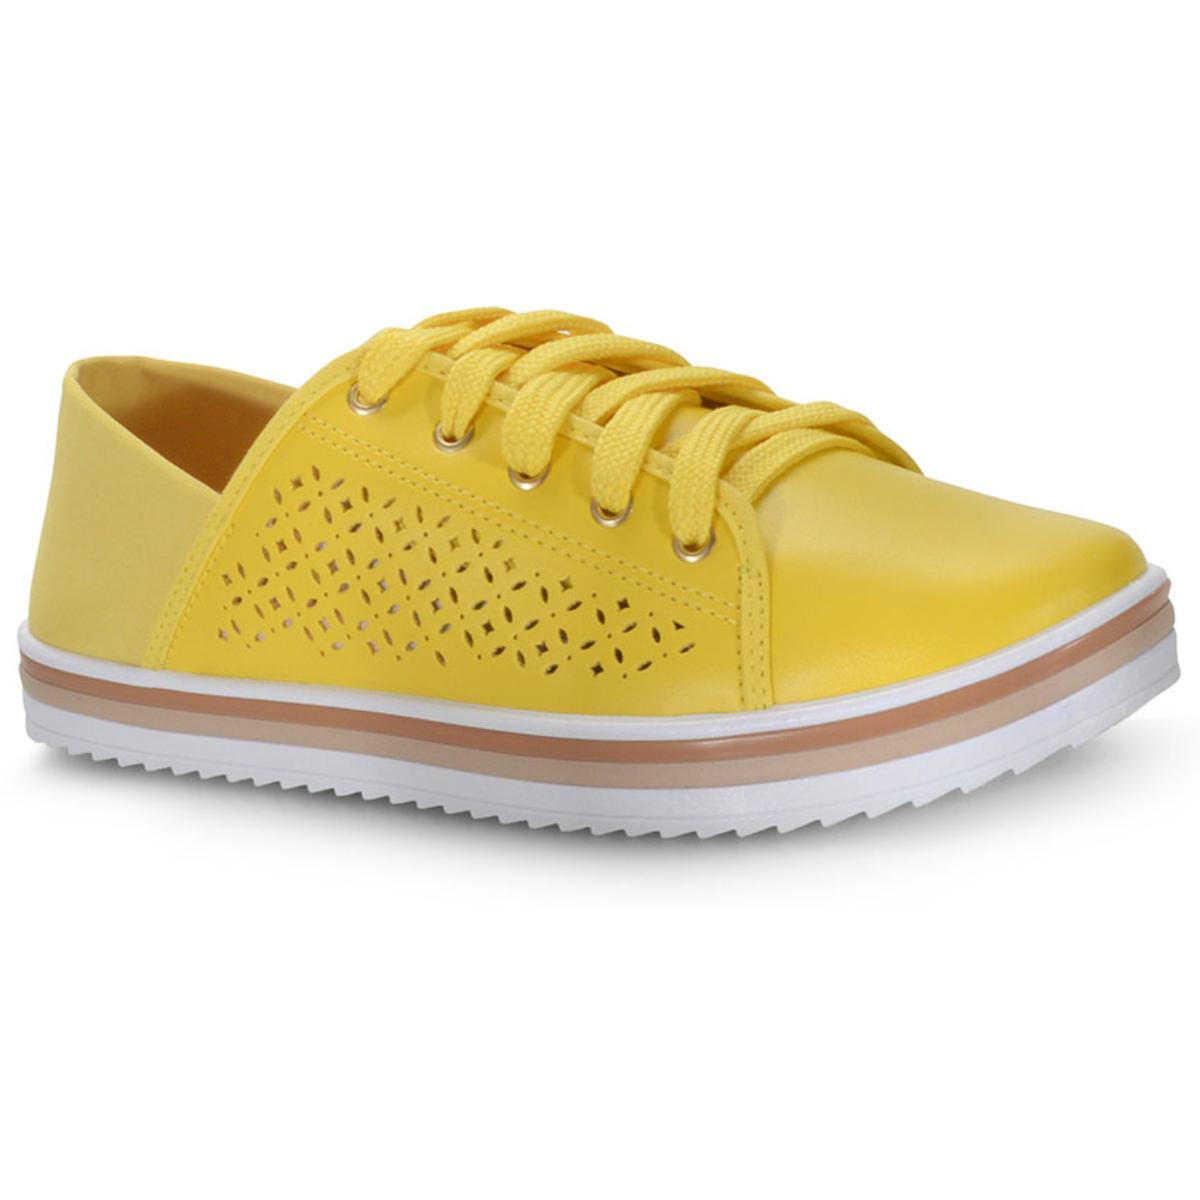 Tênis Feminino Moleca 5688103 Amarelo